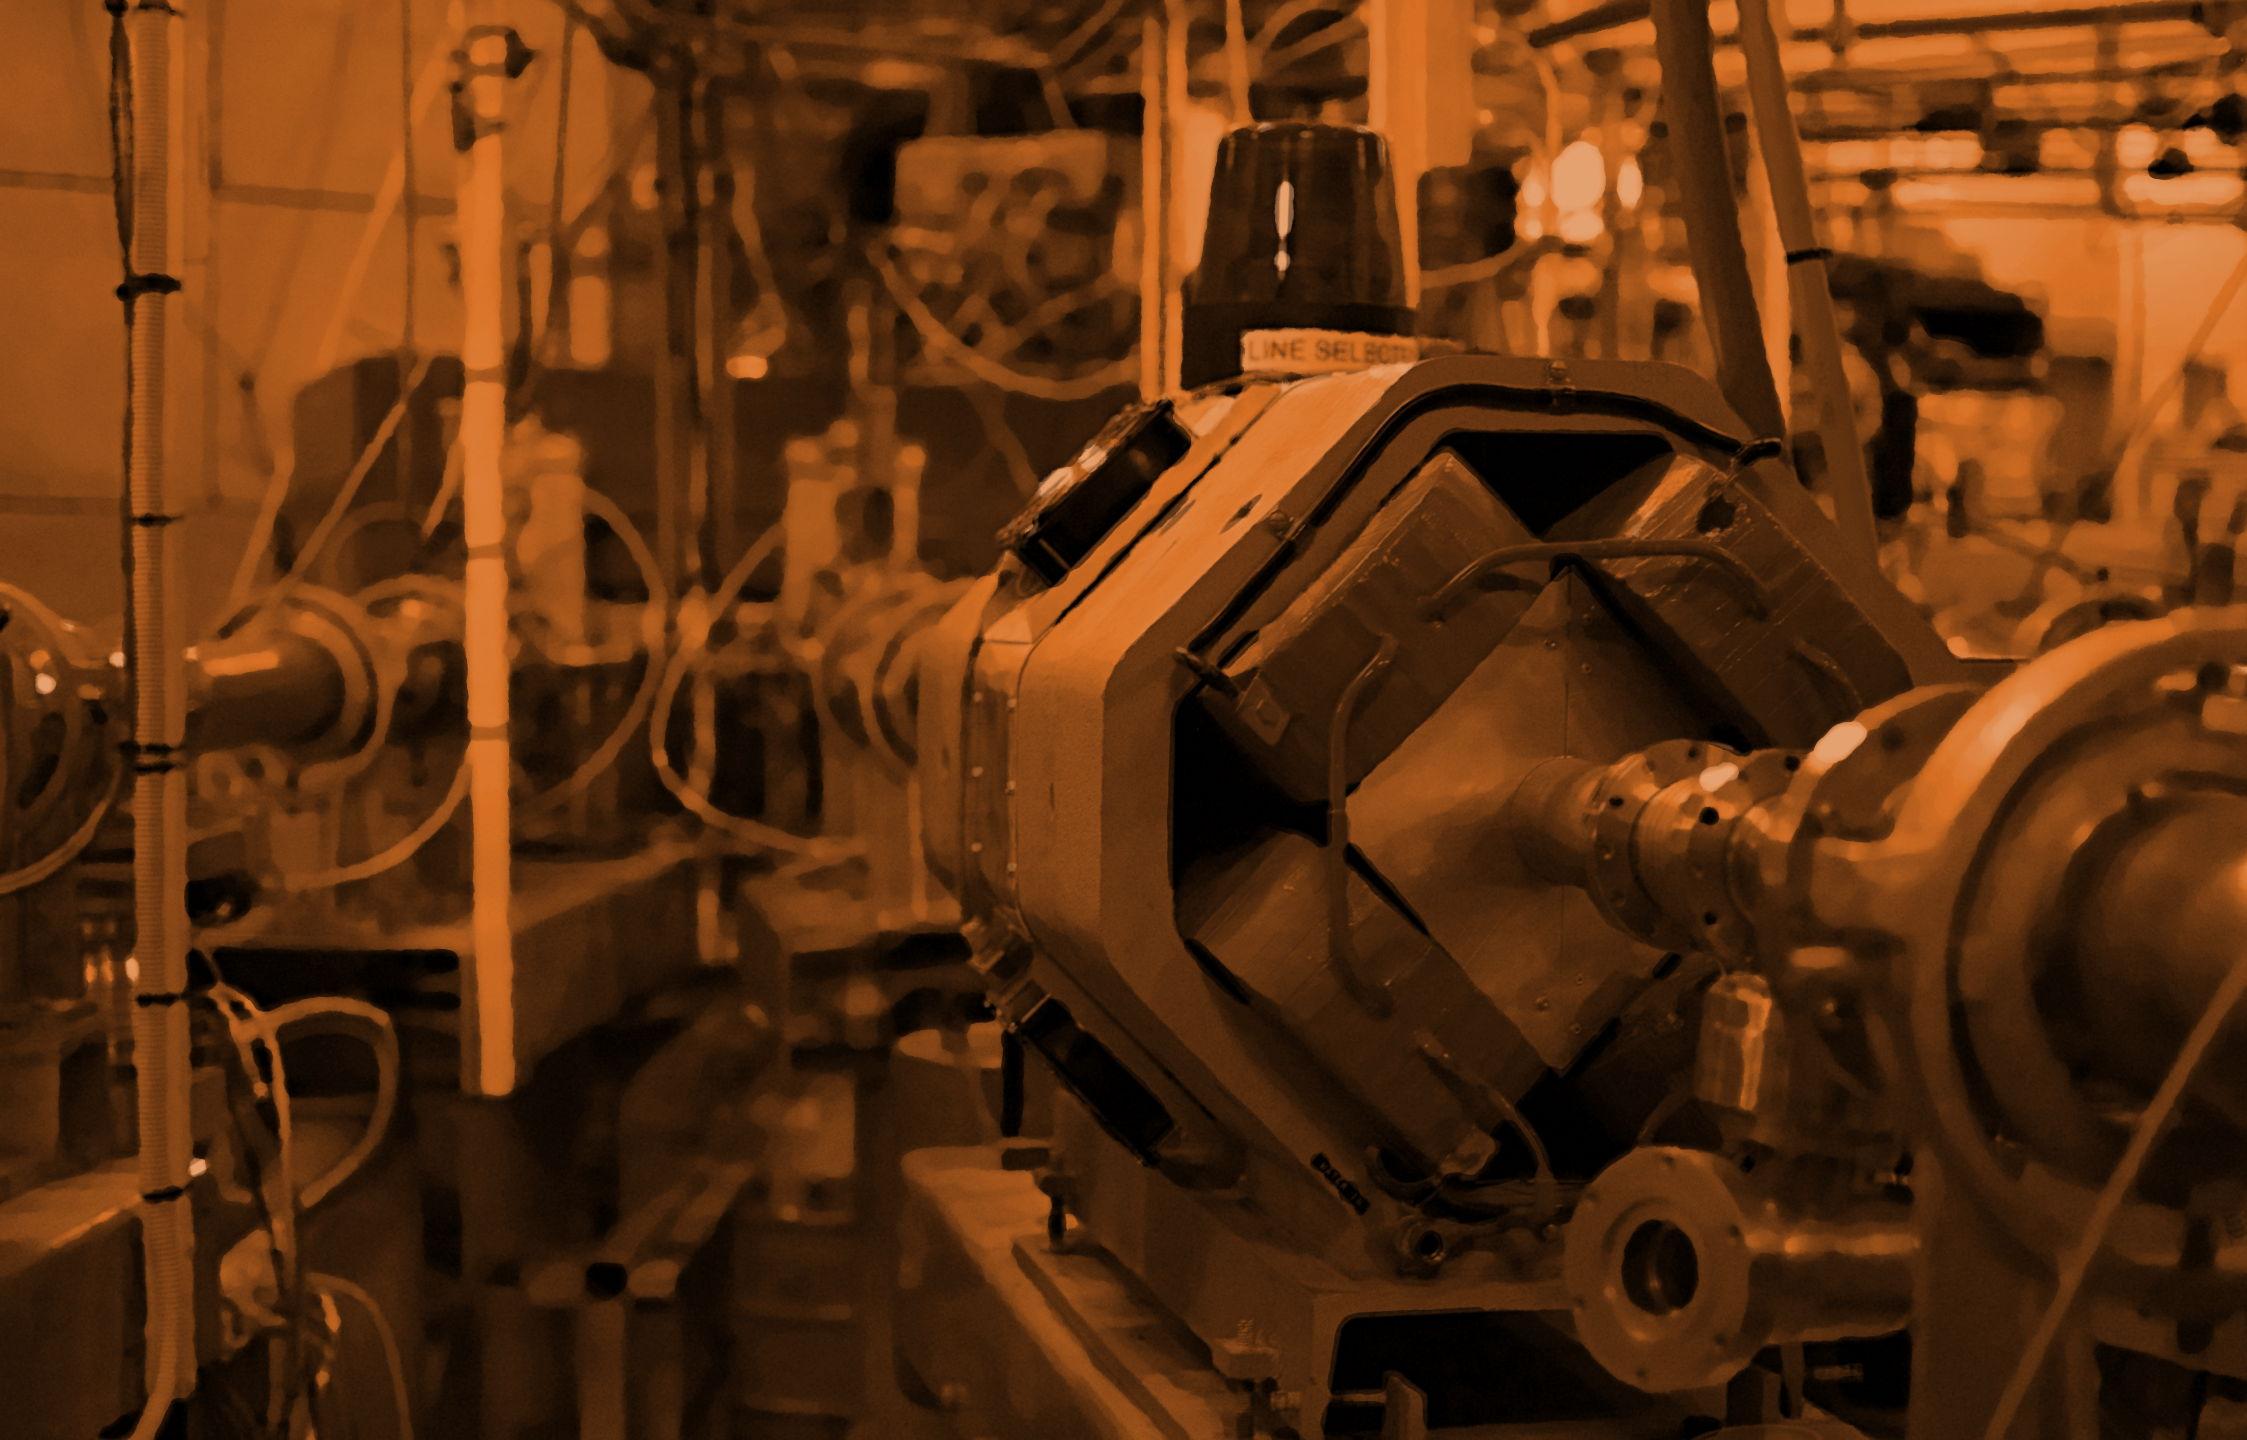 precision Metrology - Precision measurements of dark matter require precision instruments